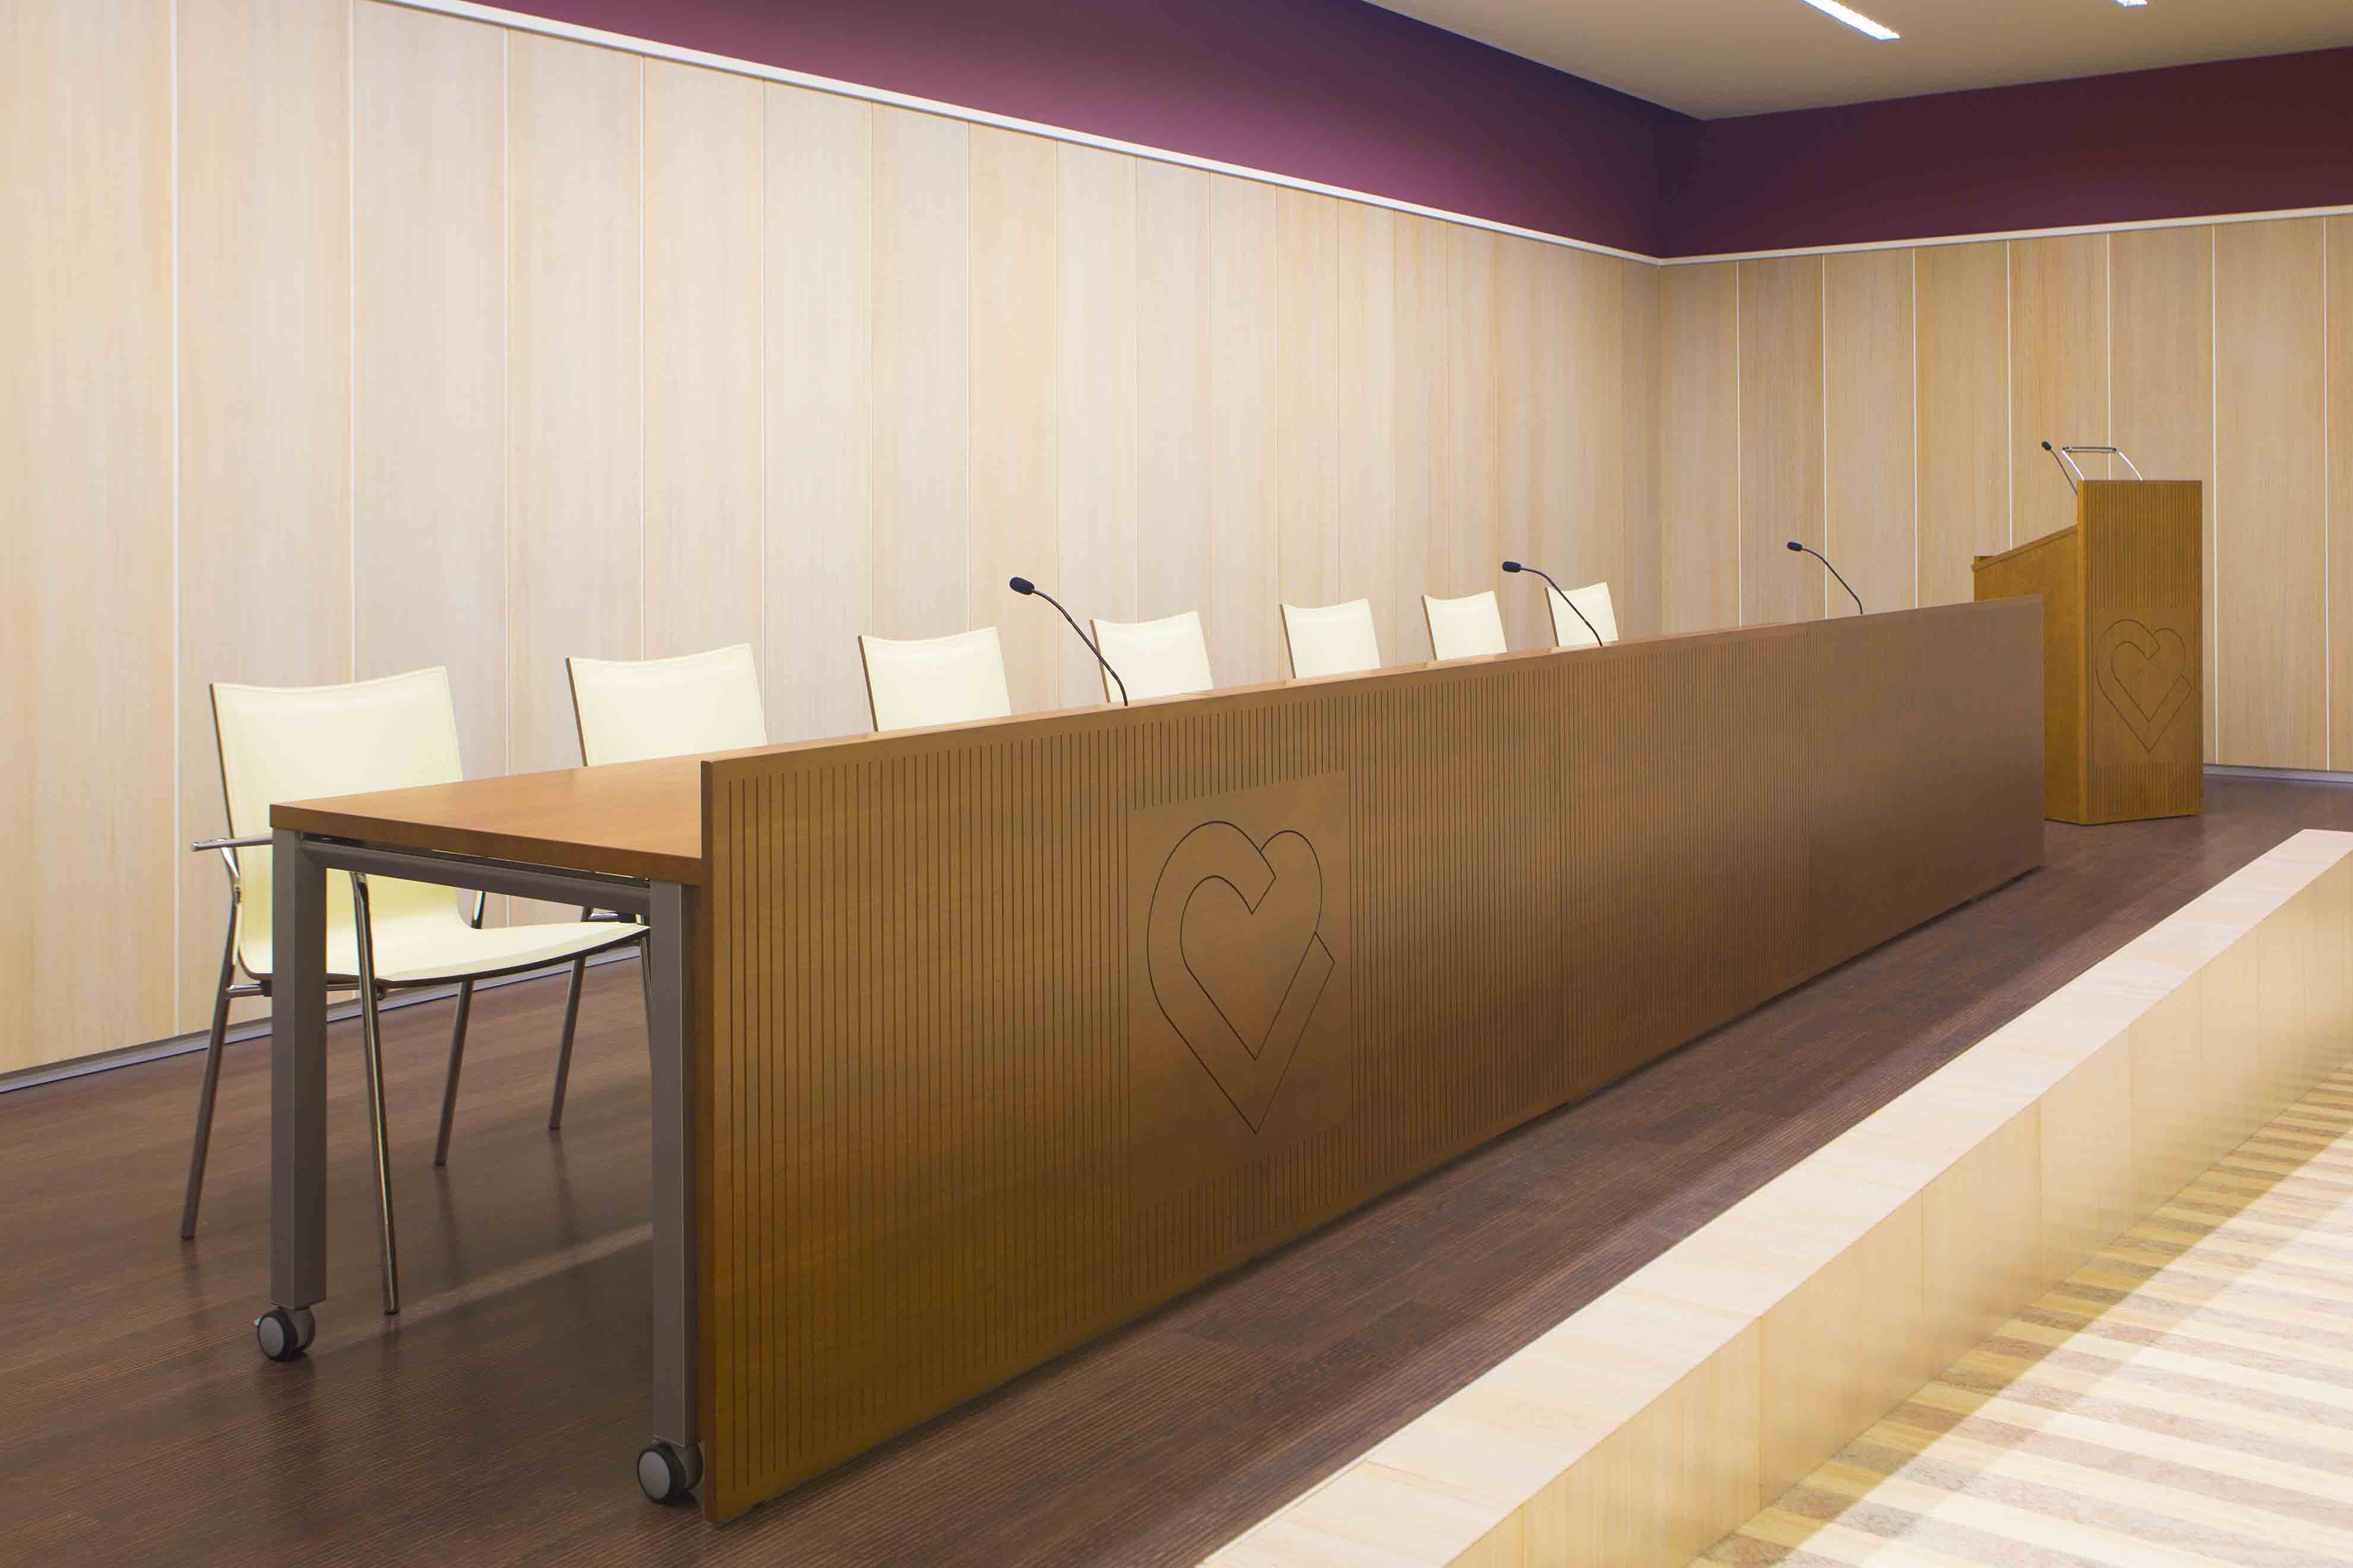 Capilla Benito Menni sala confererencias | Muebles de oficina Spacio